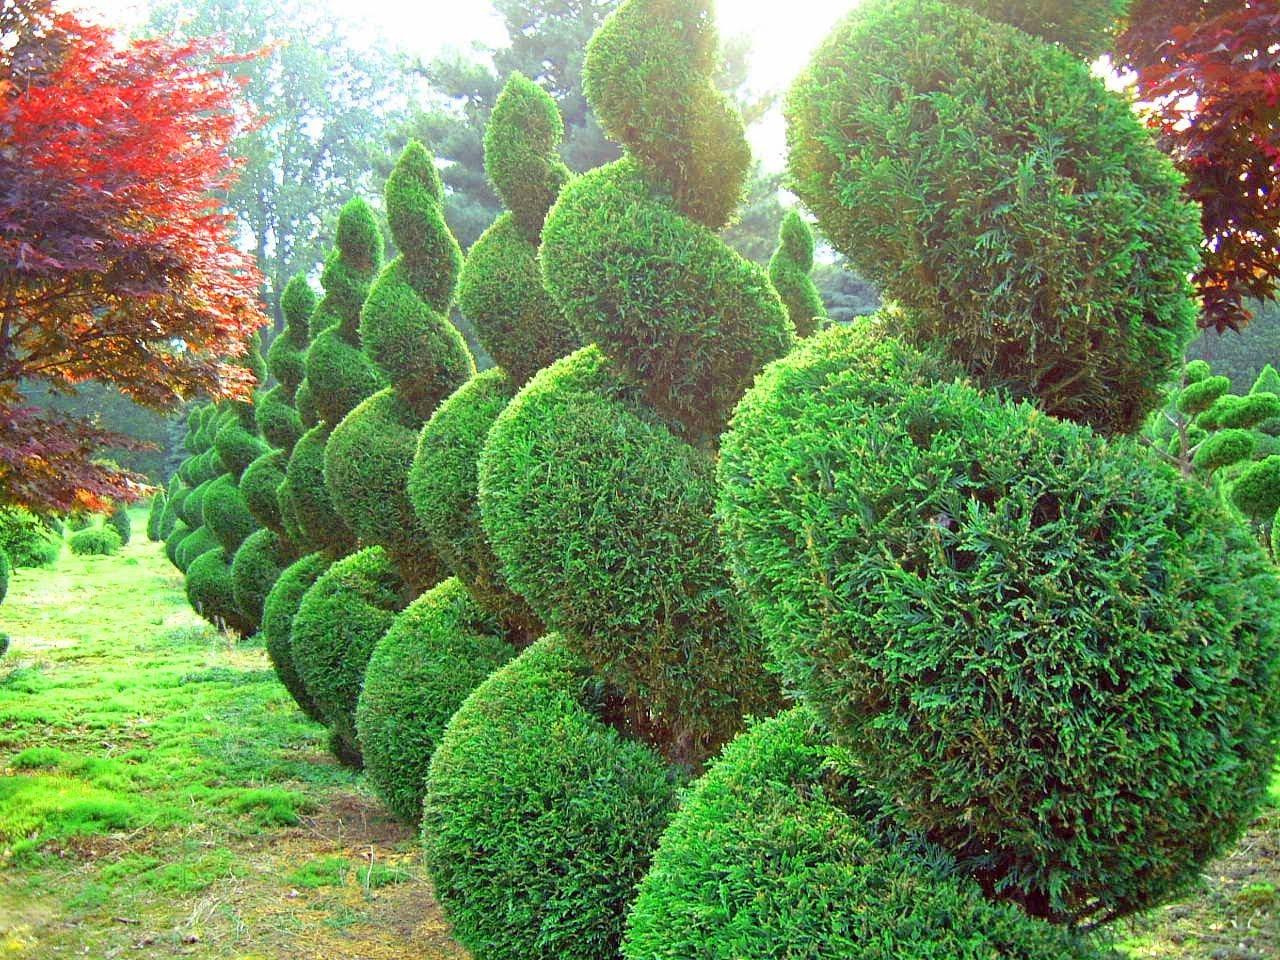 03-coniferous_bushes,_trees_25.jpg